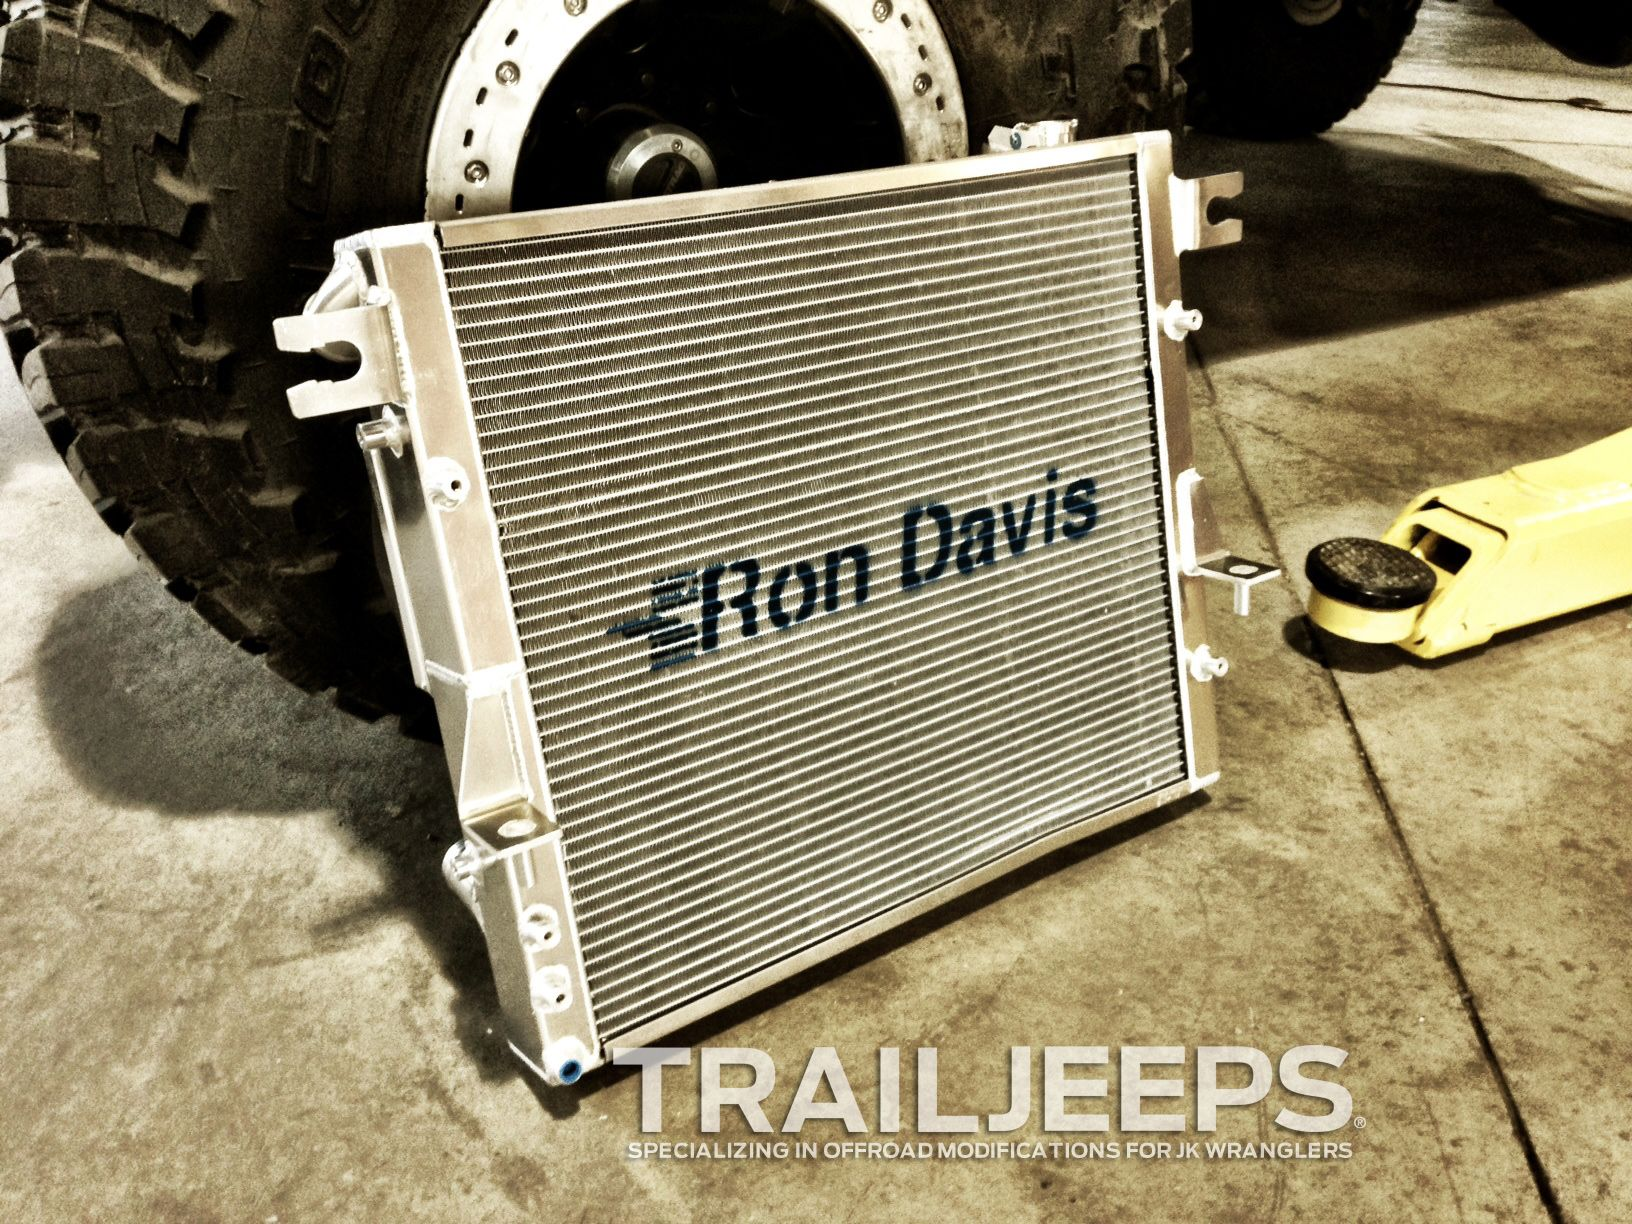 Ron Davis Aluminum Radiator Specifically Designed To Work With